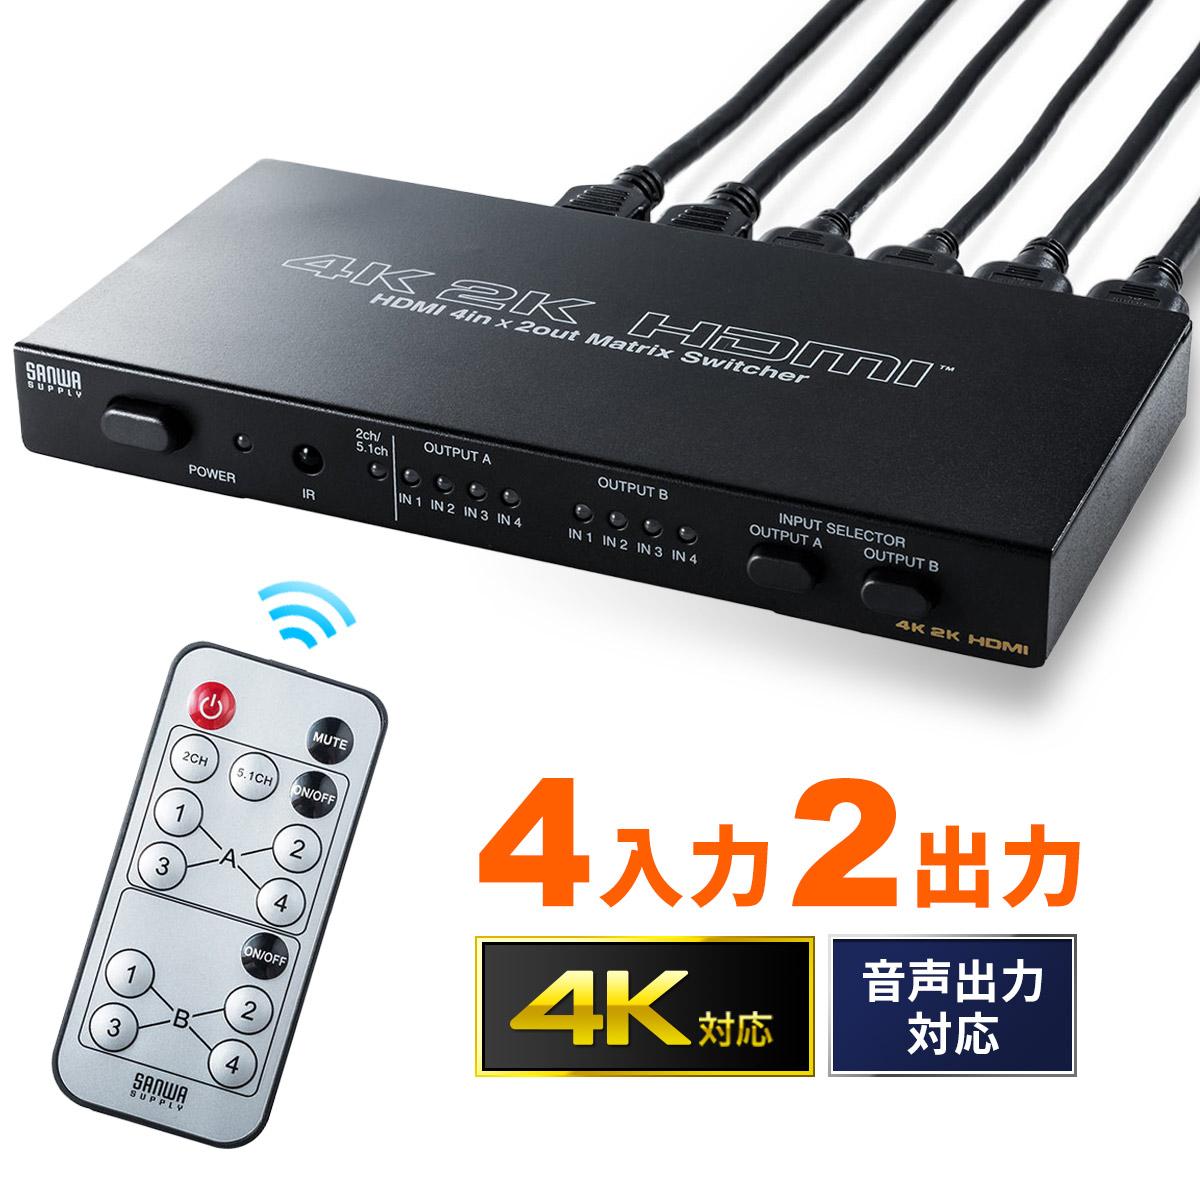 HDMI切替器 HDMIマトリックス切替器 4入力2出力 4K/30Hz対応 リモコン付き 光・同軸デジタル出力付き HDMI セレクター 切替機 手動切替 リモコン切替 [400-SW027]【サンワダイレクト限定品】【送料無料】